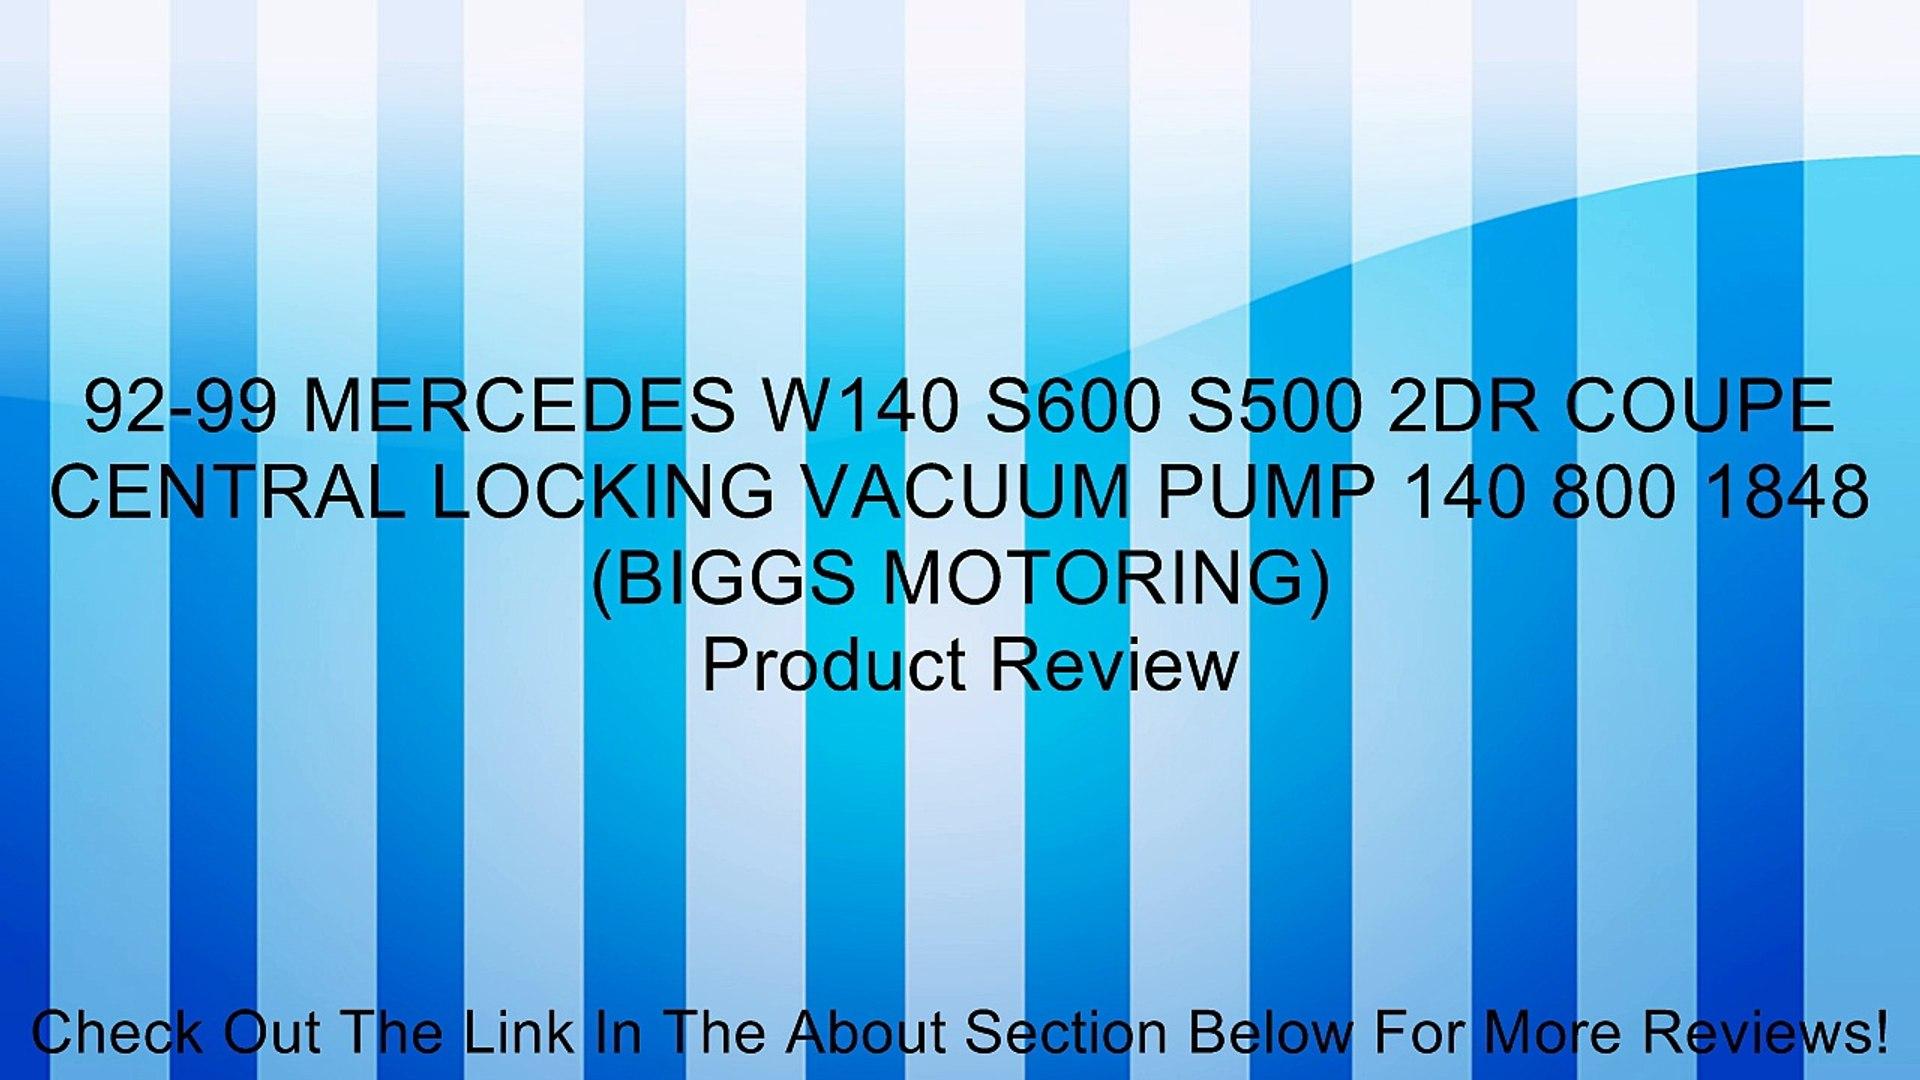 BIGGS MOTORING 92-99 MERCEDES W140 S600 S500 2DR COUPE CENTRAL LOCKING VACUUM PUMP 140 800 1848